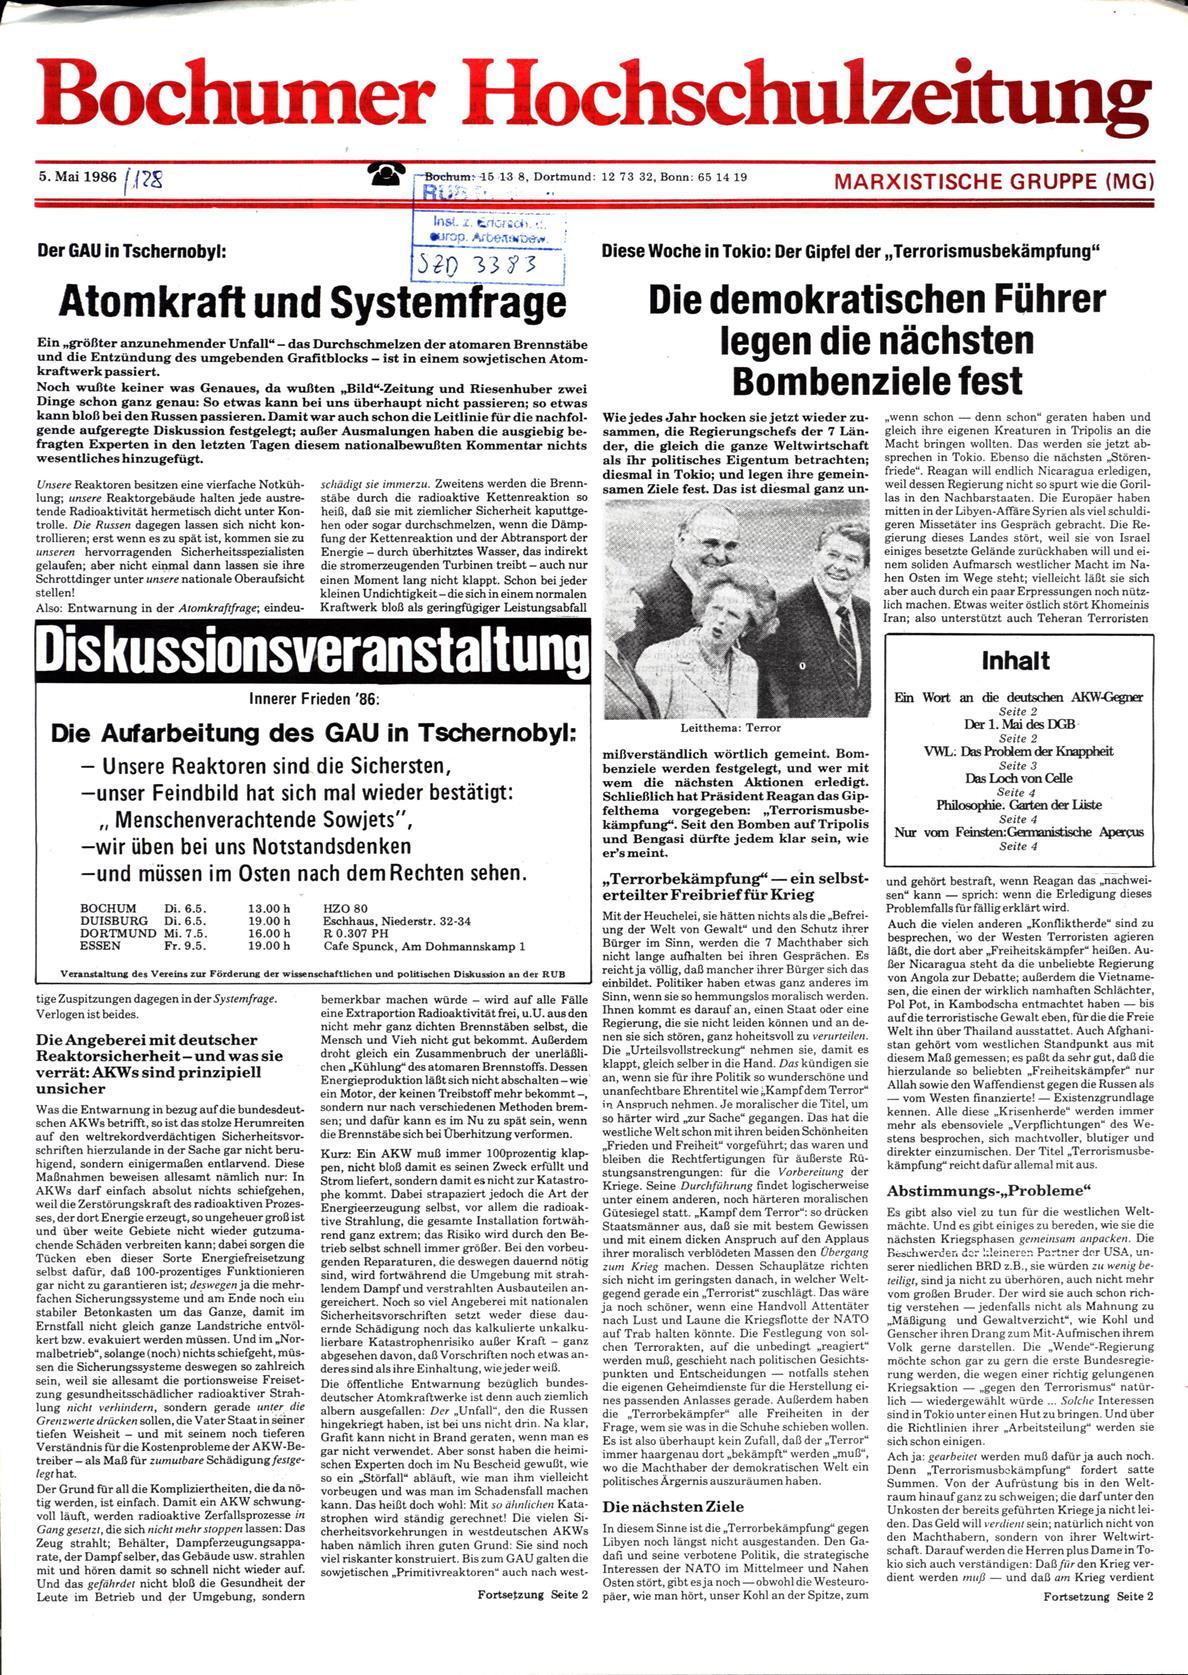 Bochum_BHZ_19860505_128_001